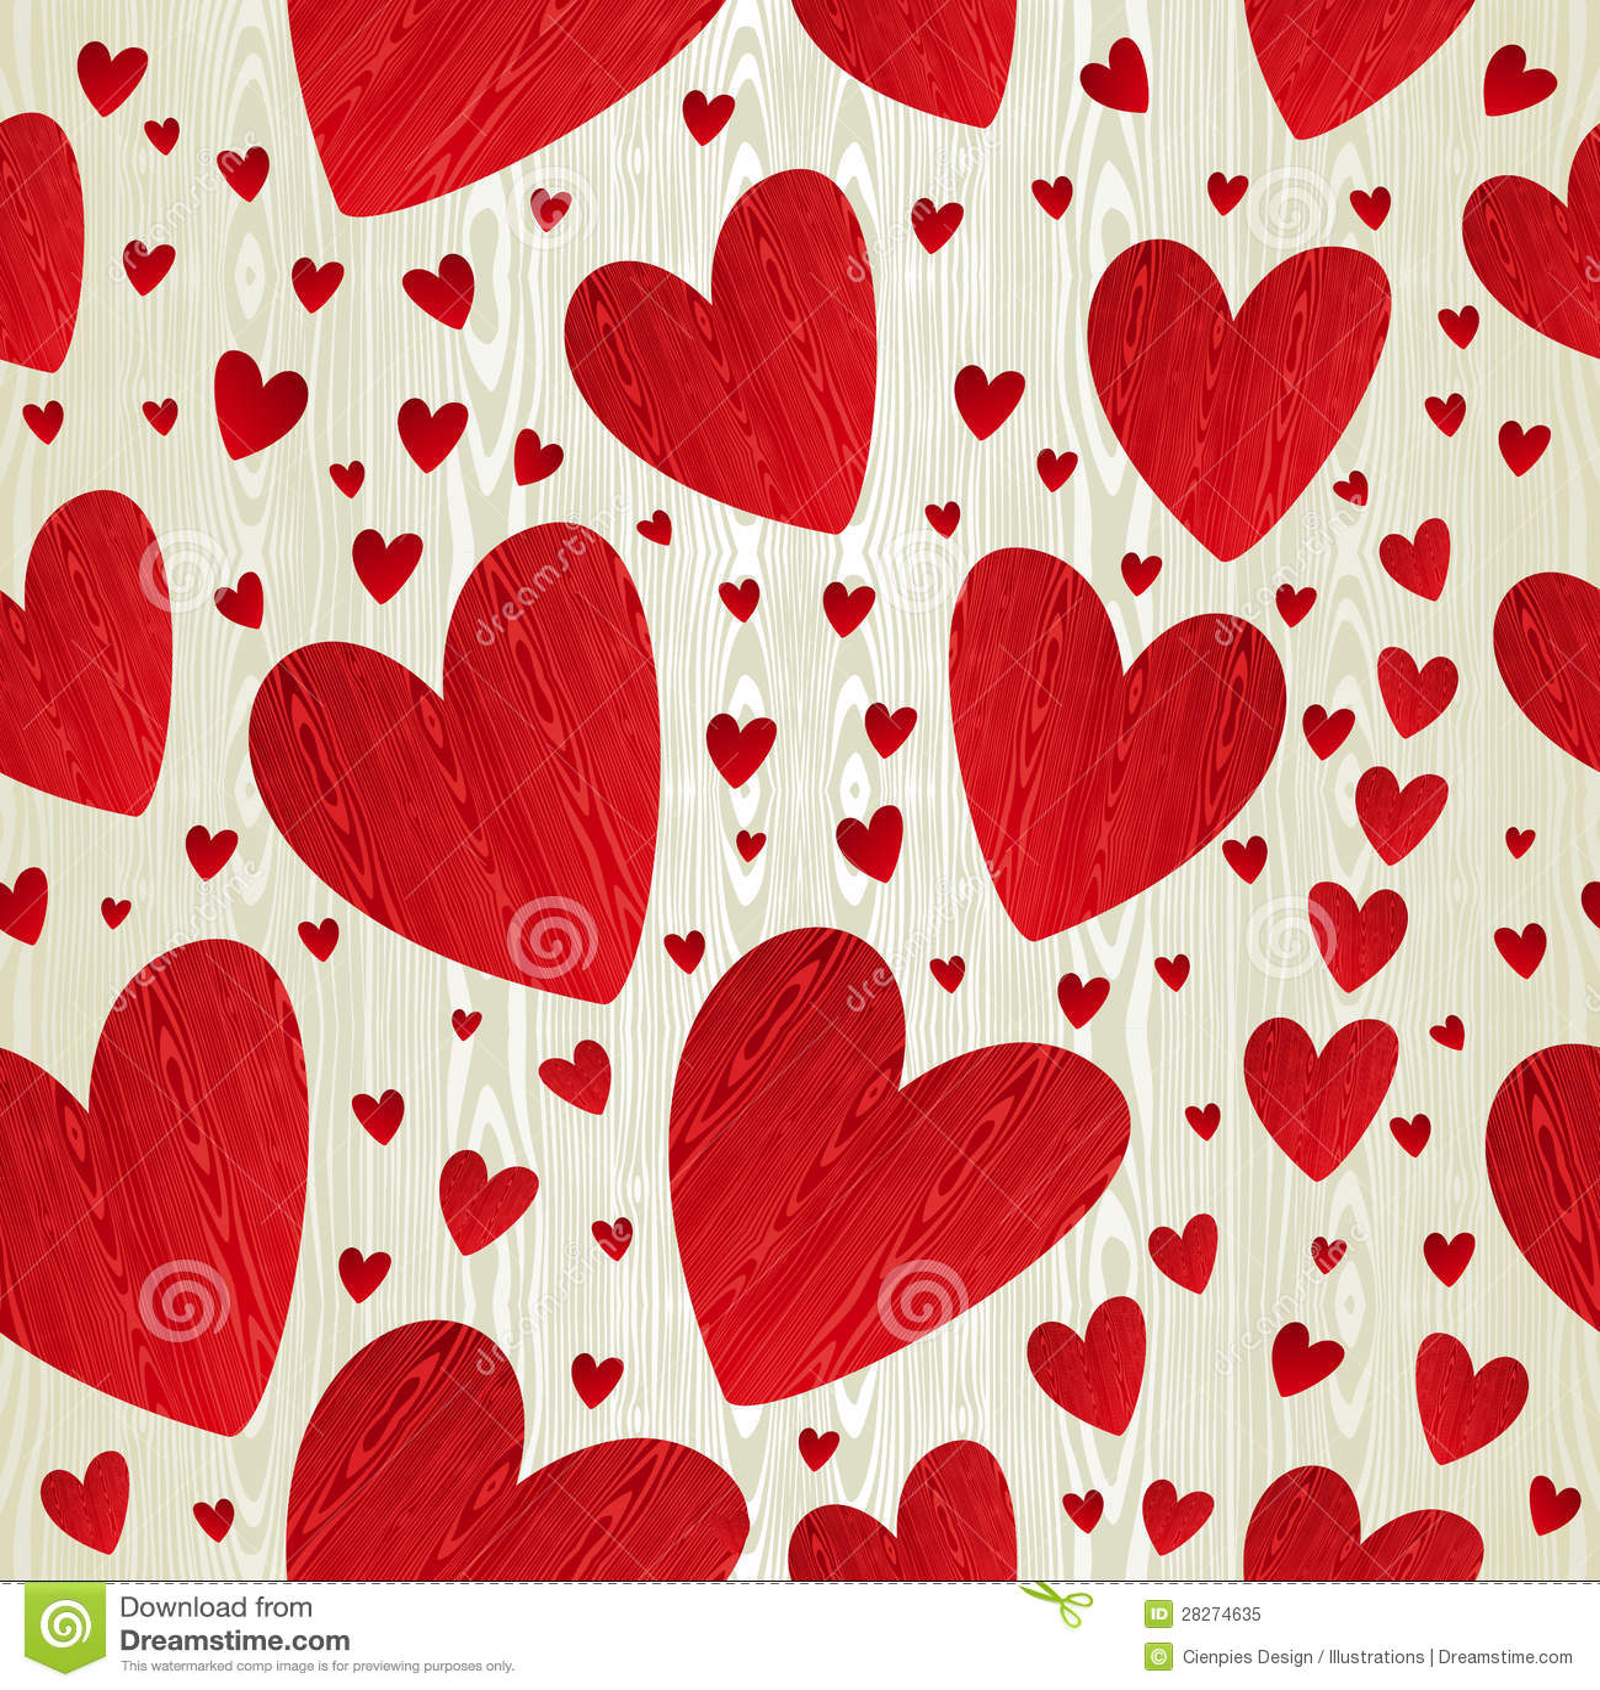 Wooden heart patterns download